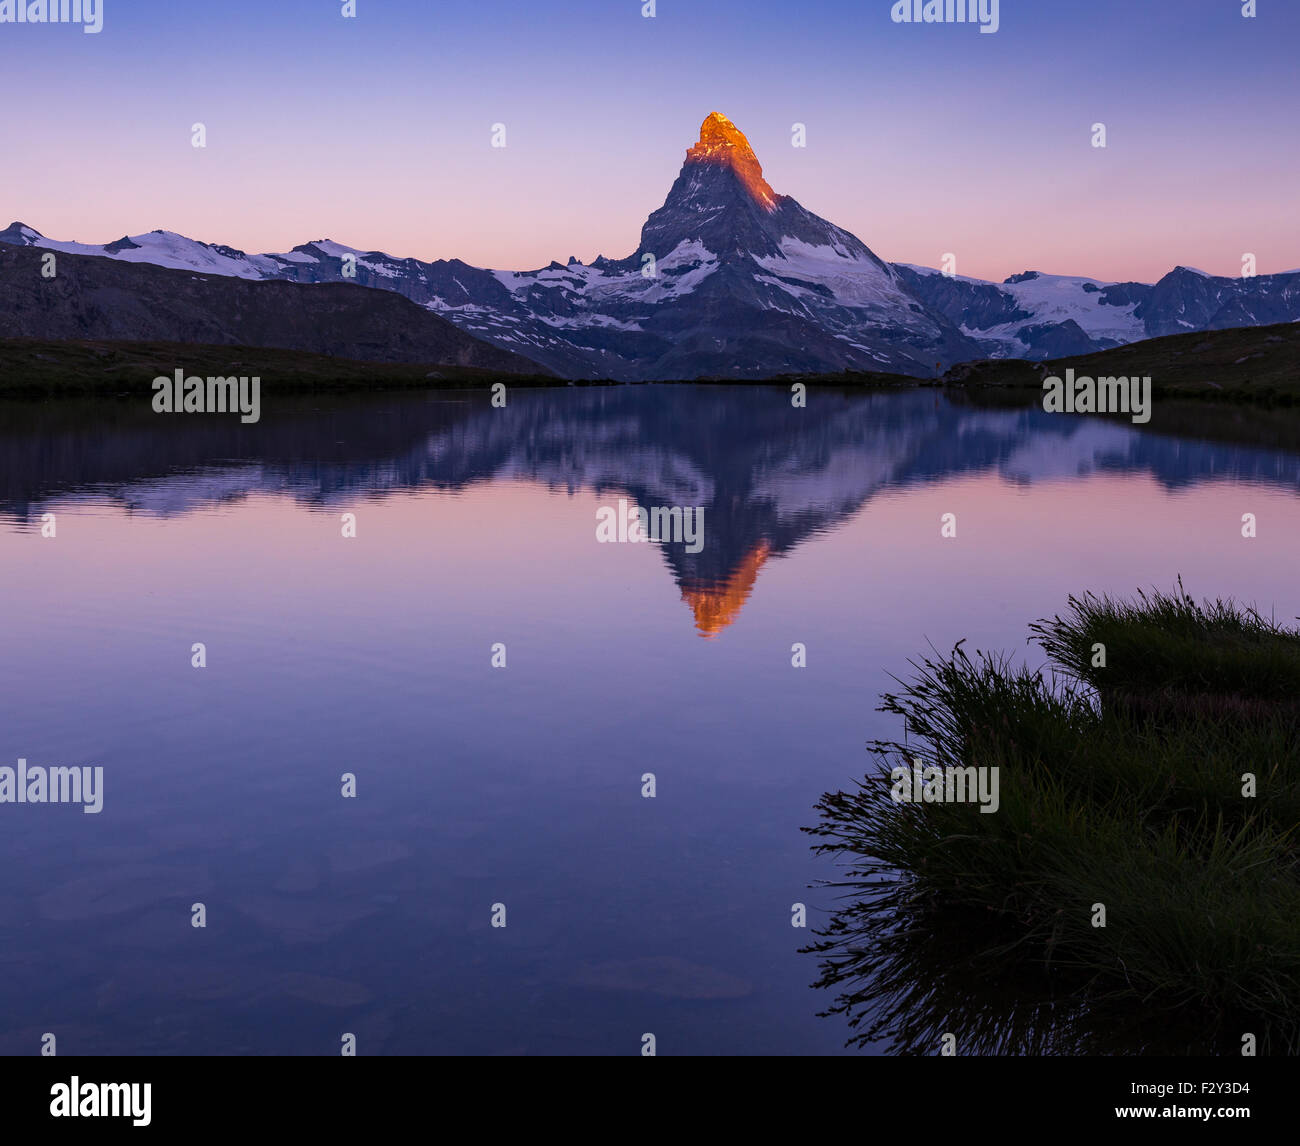 Alba sul Mt.Matterhorn (Cervino). Lago Stellisee, Zermatt, Svizzera Immagini Stock